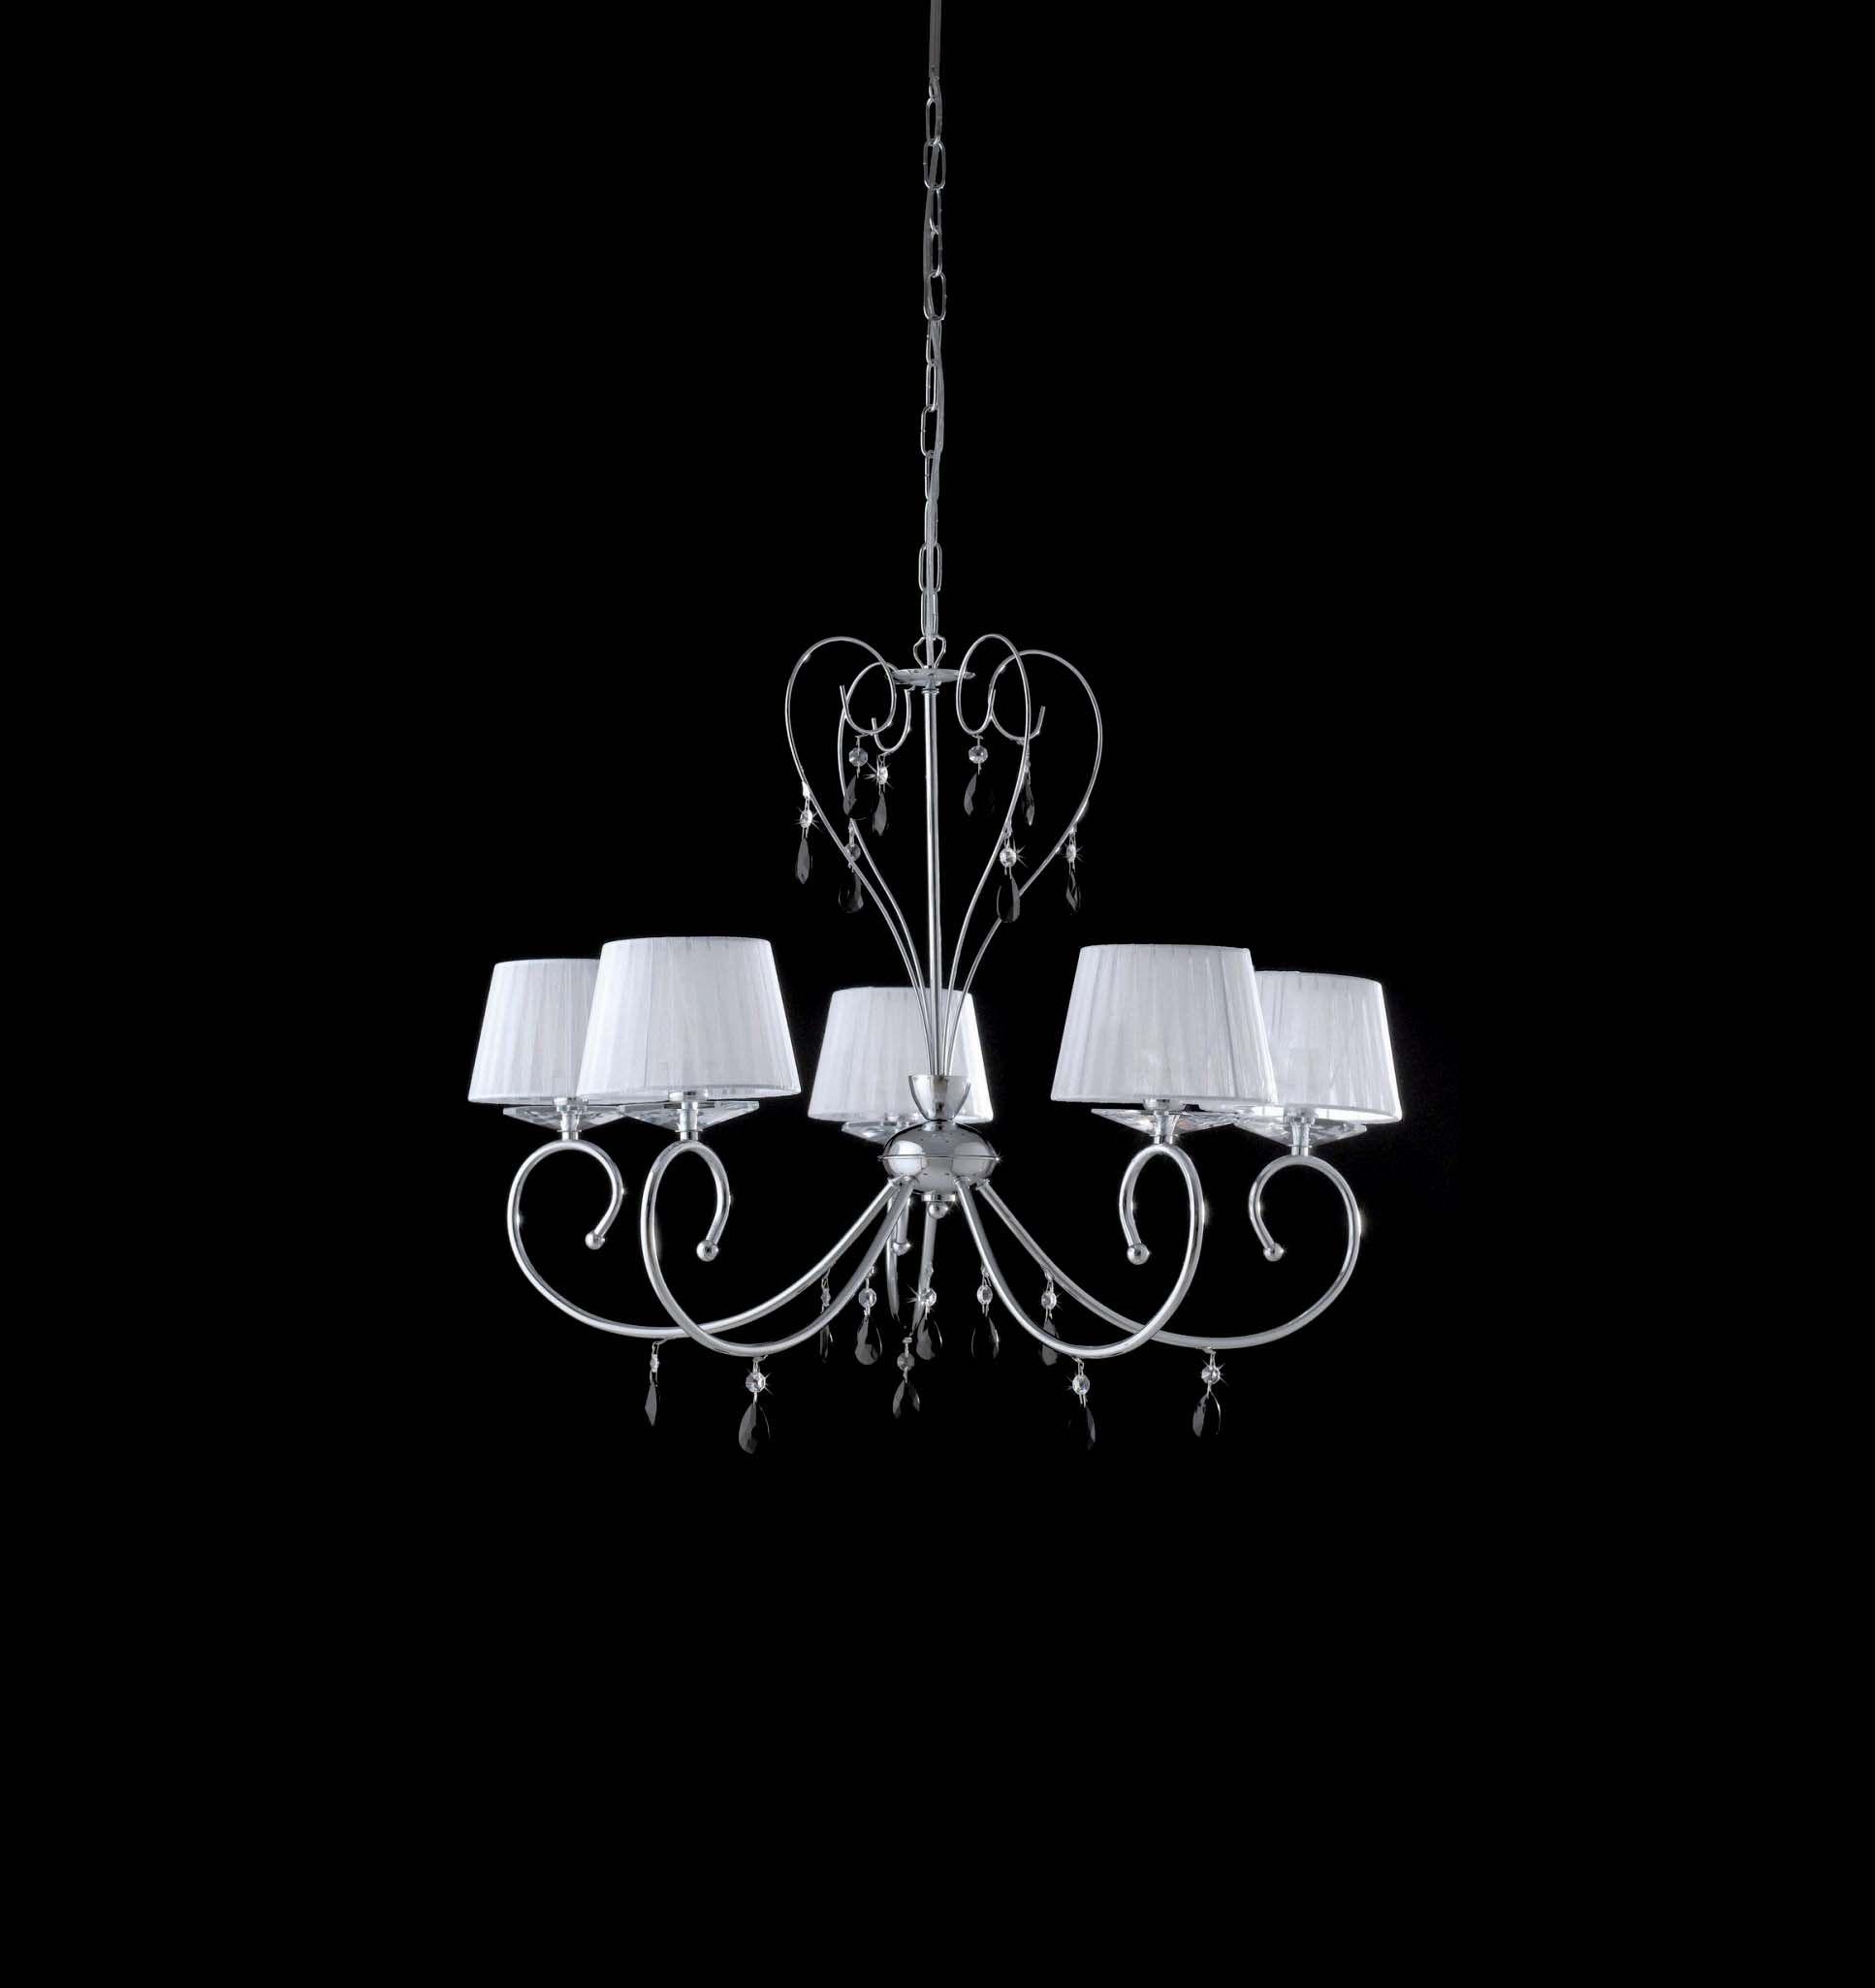 Lampadario moderno con cristalli neri 5 luci LGT Vegas sp5